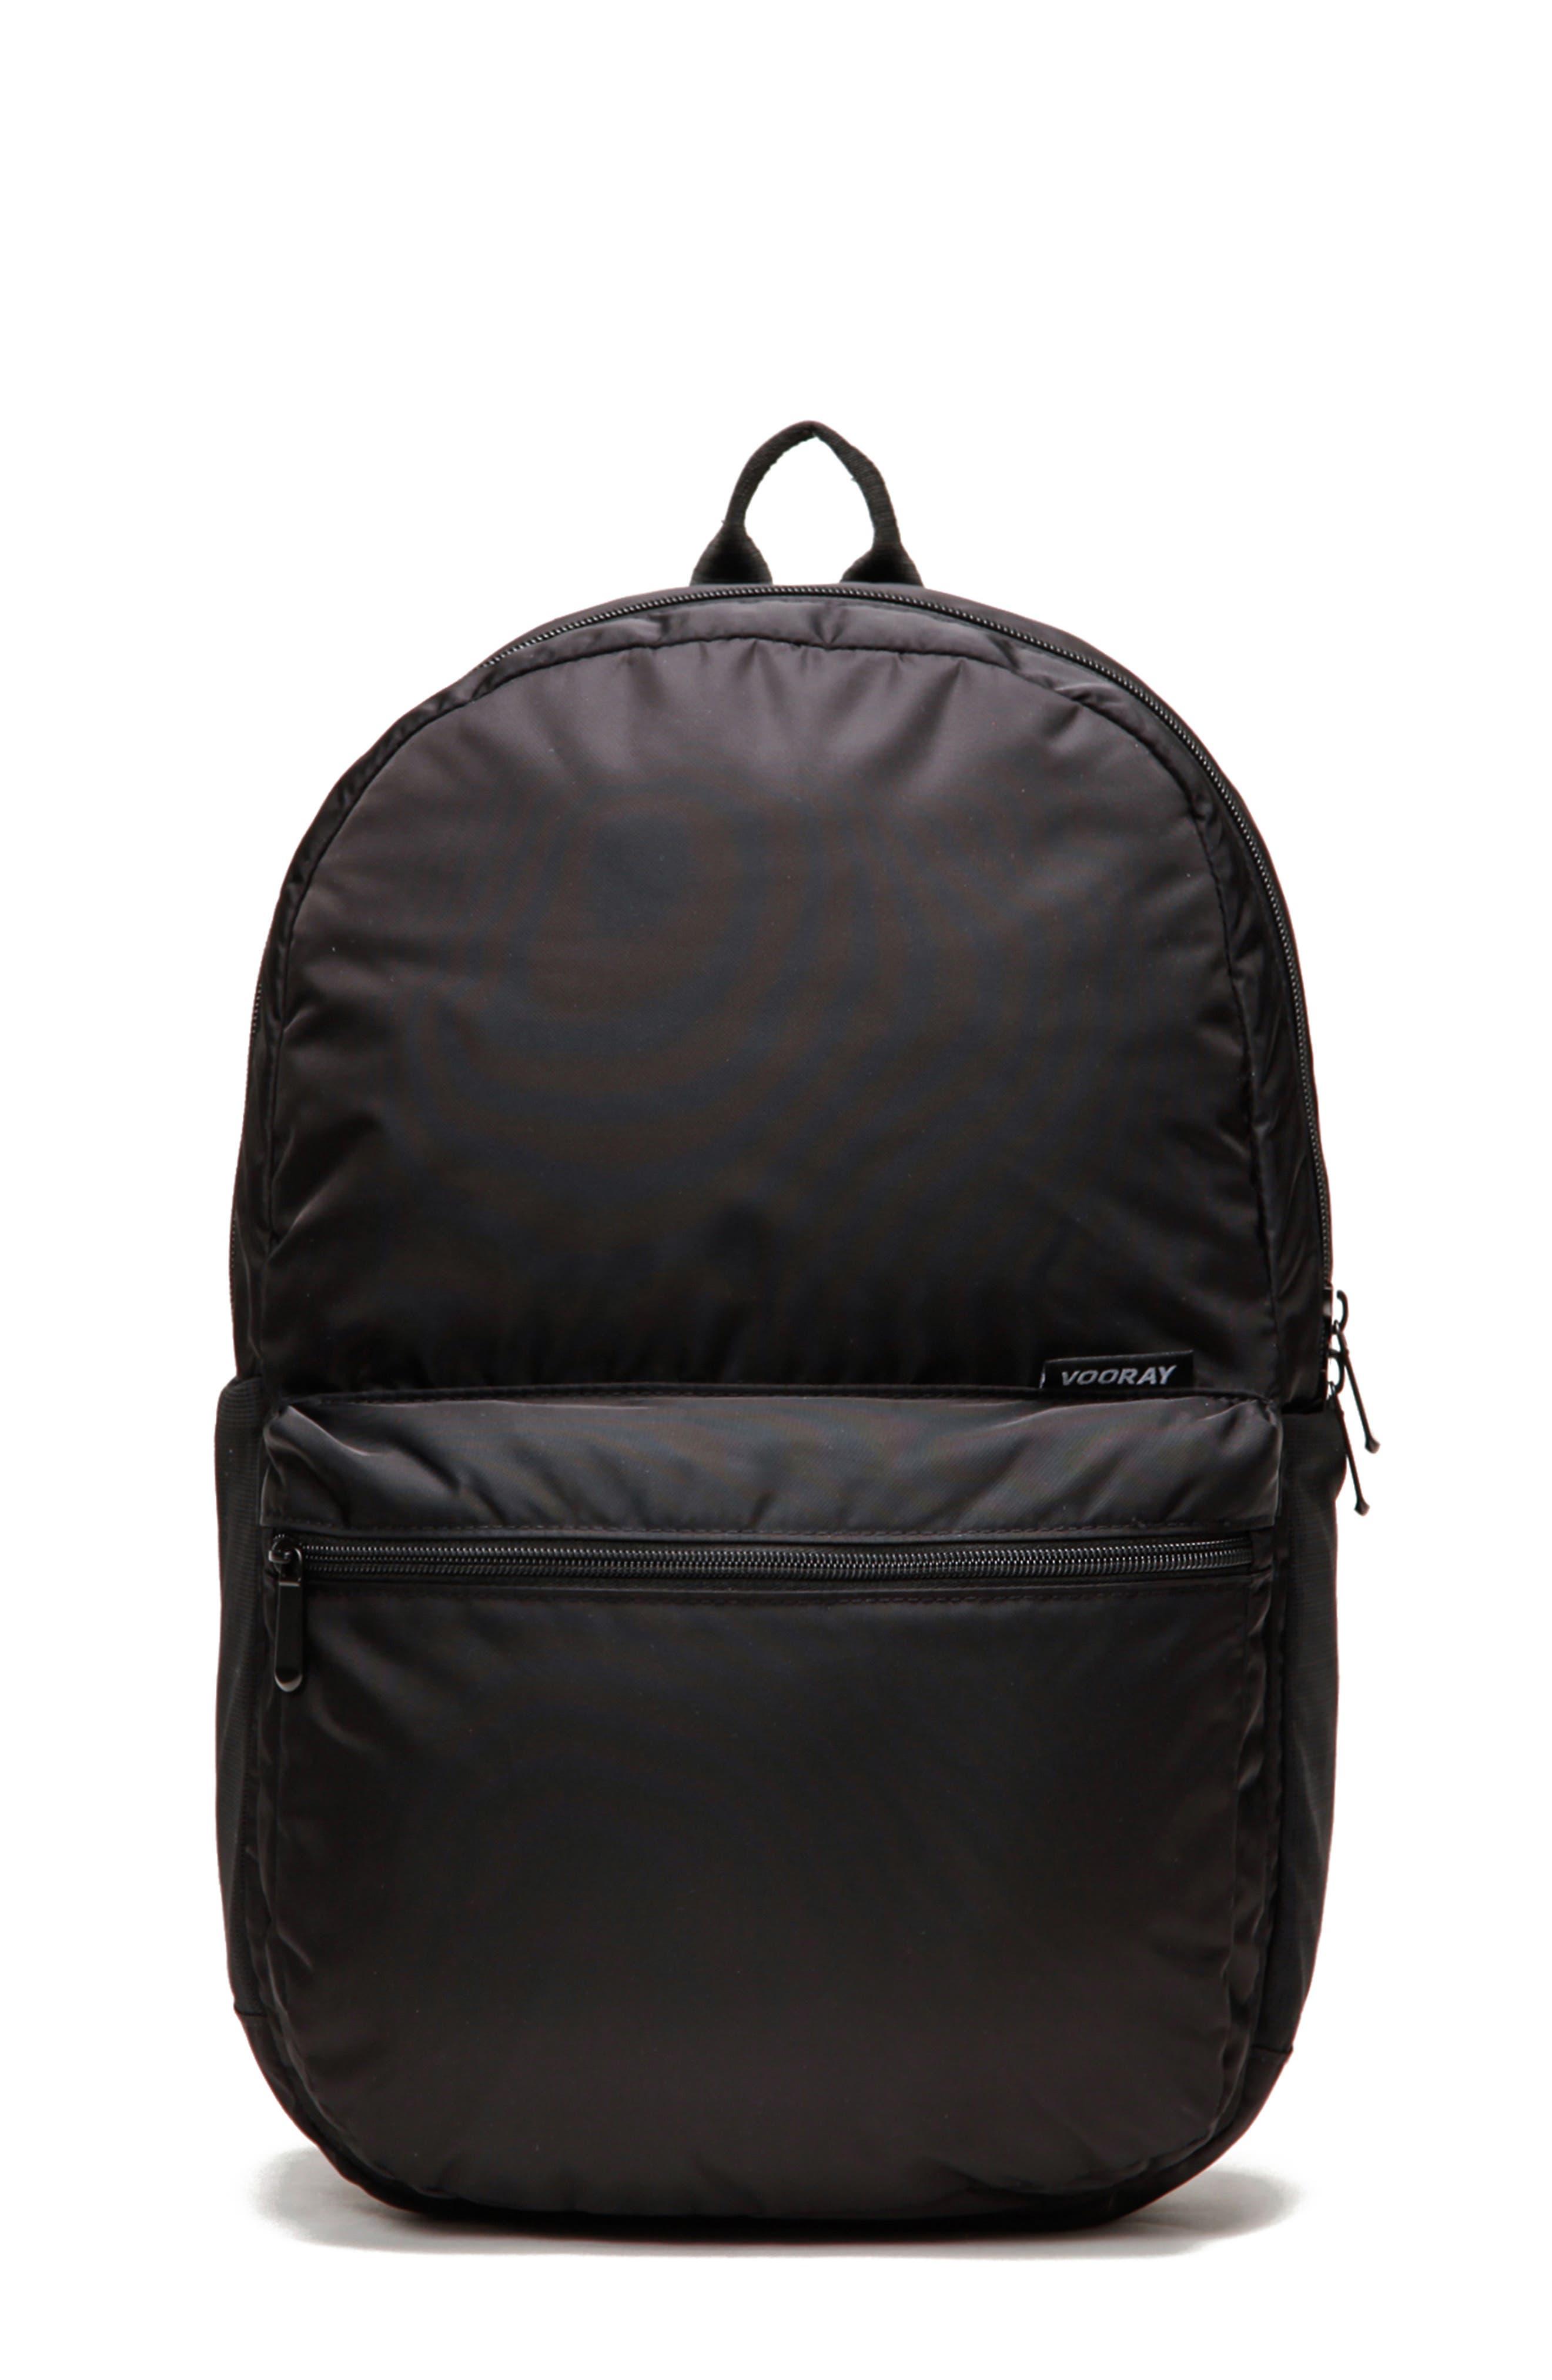 Ace Backpack,                             Main thumbnail 1, color,                             BLACK NYLON